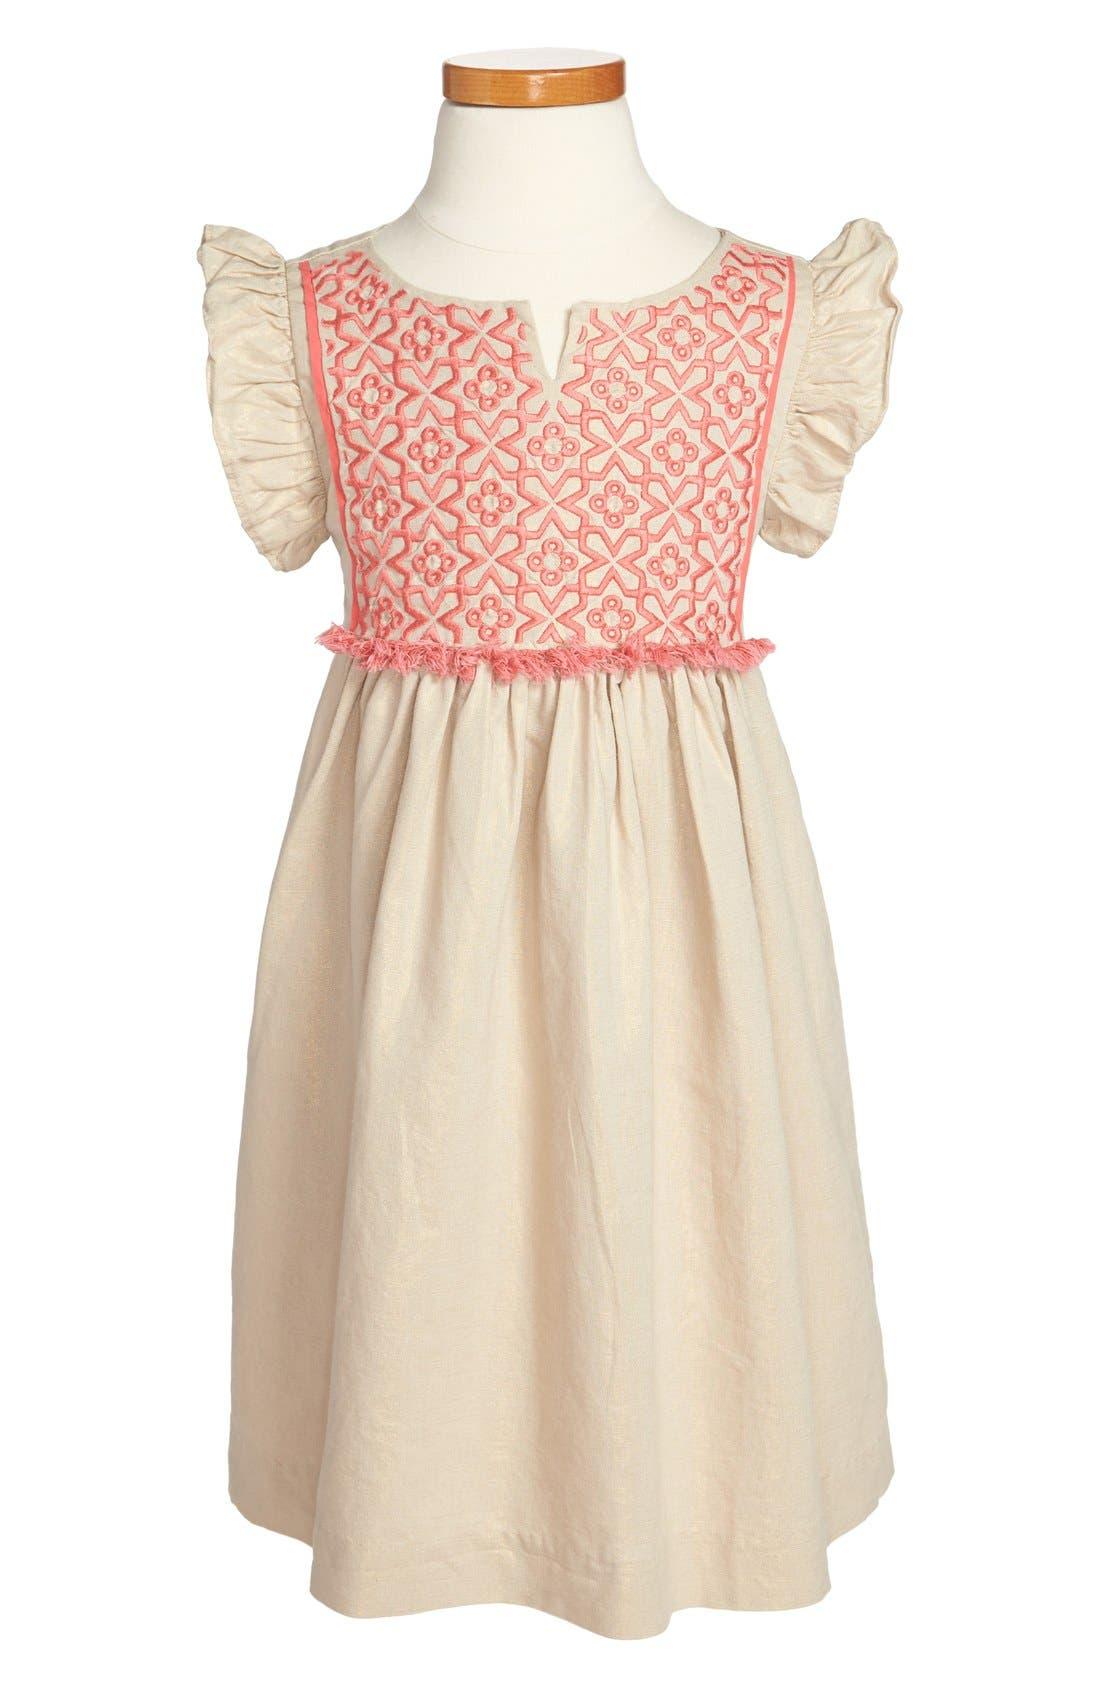 Main Image - Tea Collection 'Nabila Sparkle' Flutter Sleeve Dress (Toddler Girls, Little Girls & Big Girls)